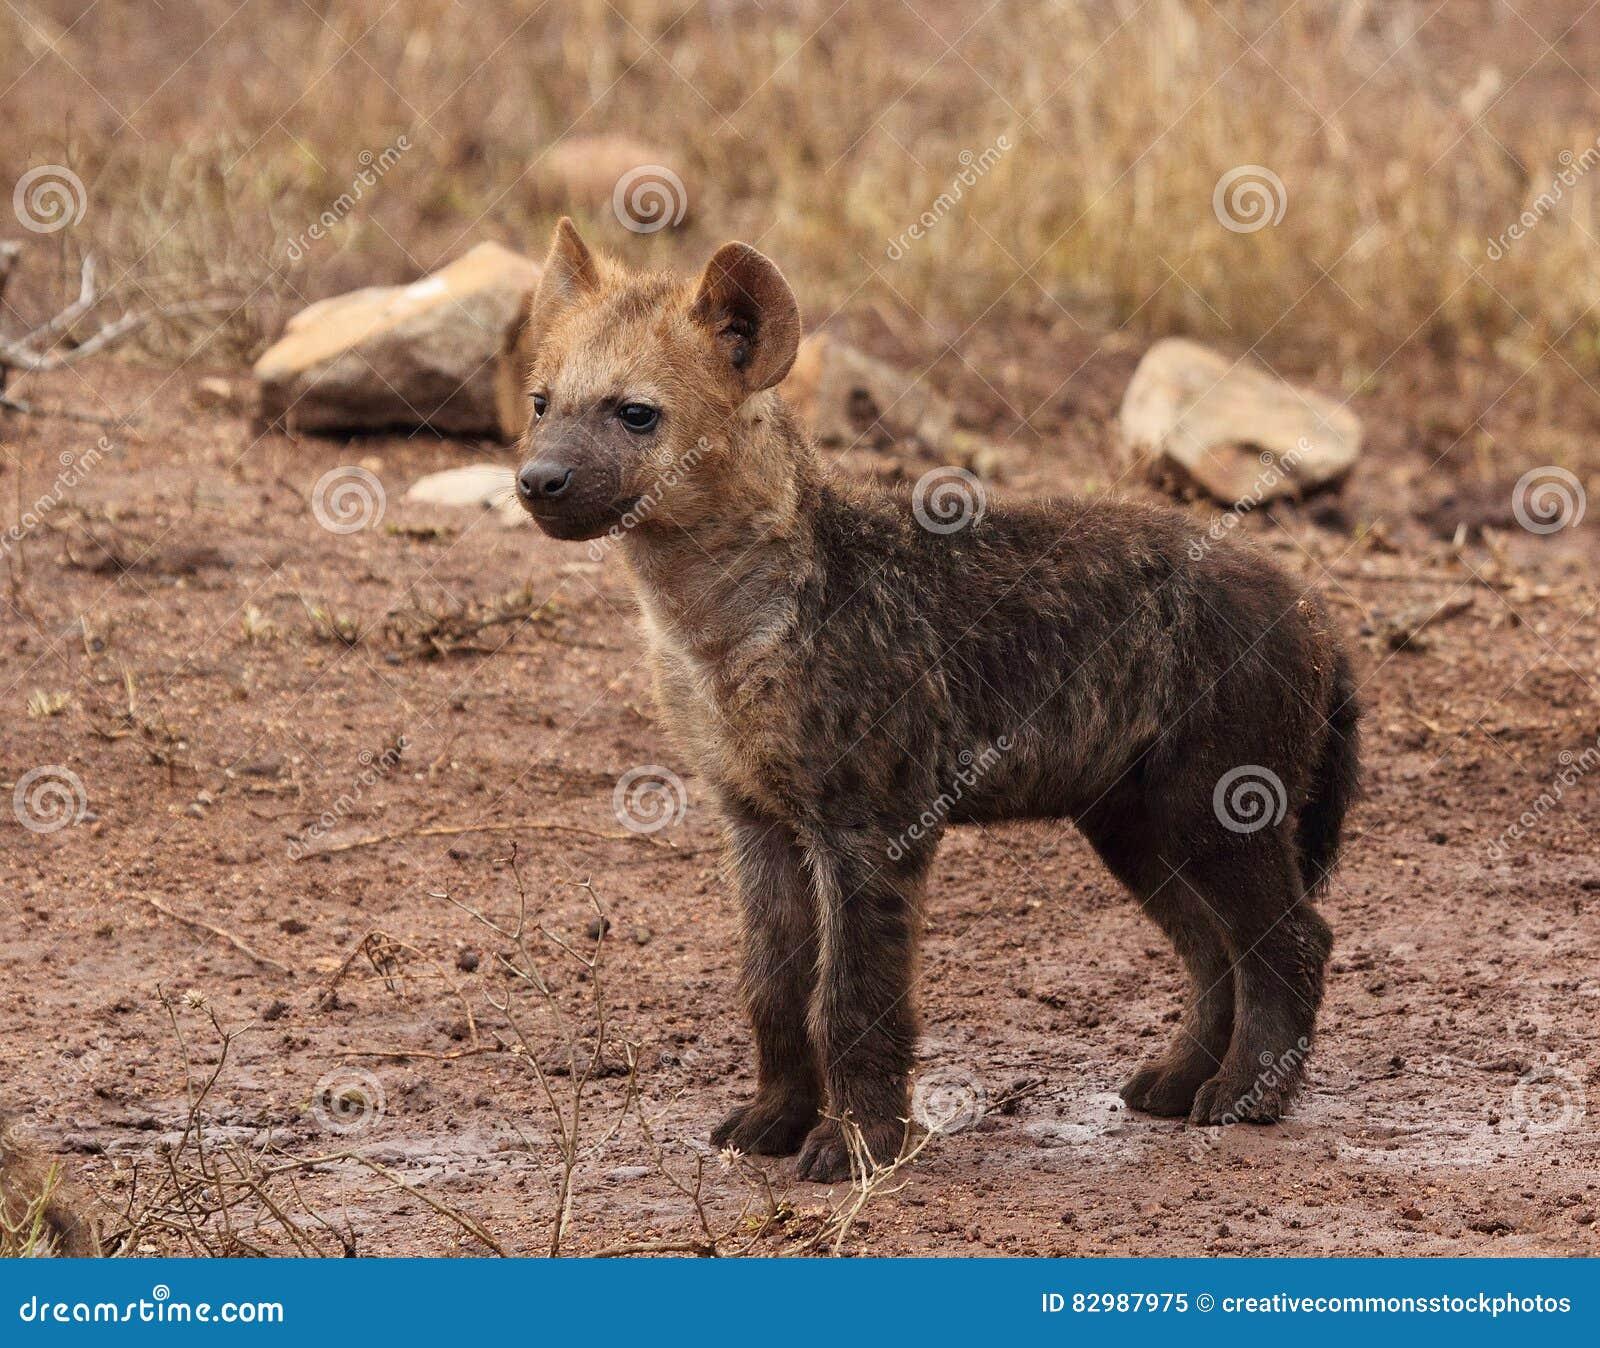 Download Brown Hyena Cub stock image. Image of hyaena, wildlife - 82987975